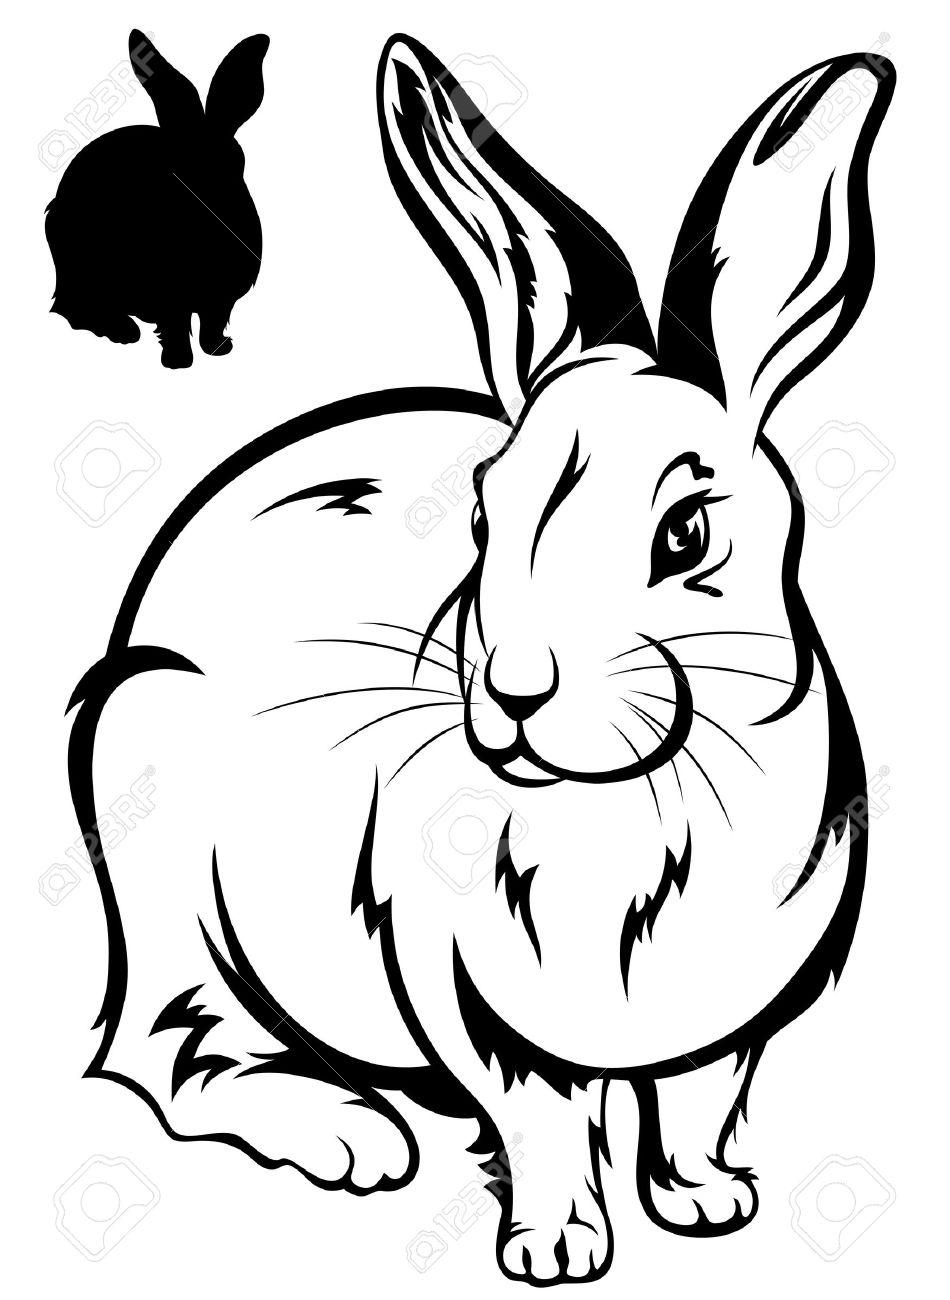 950x1300 Cute Rabbit Illustration